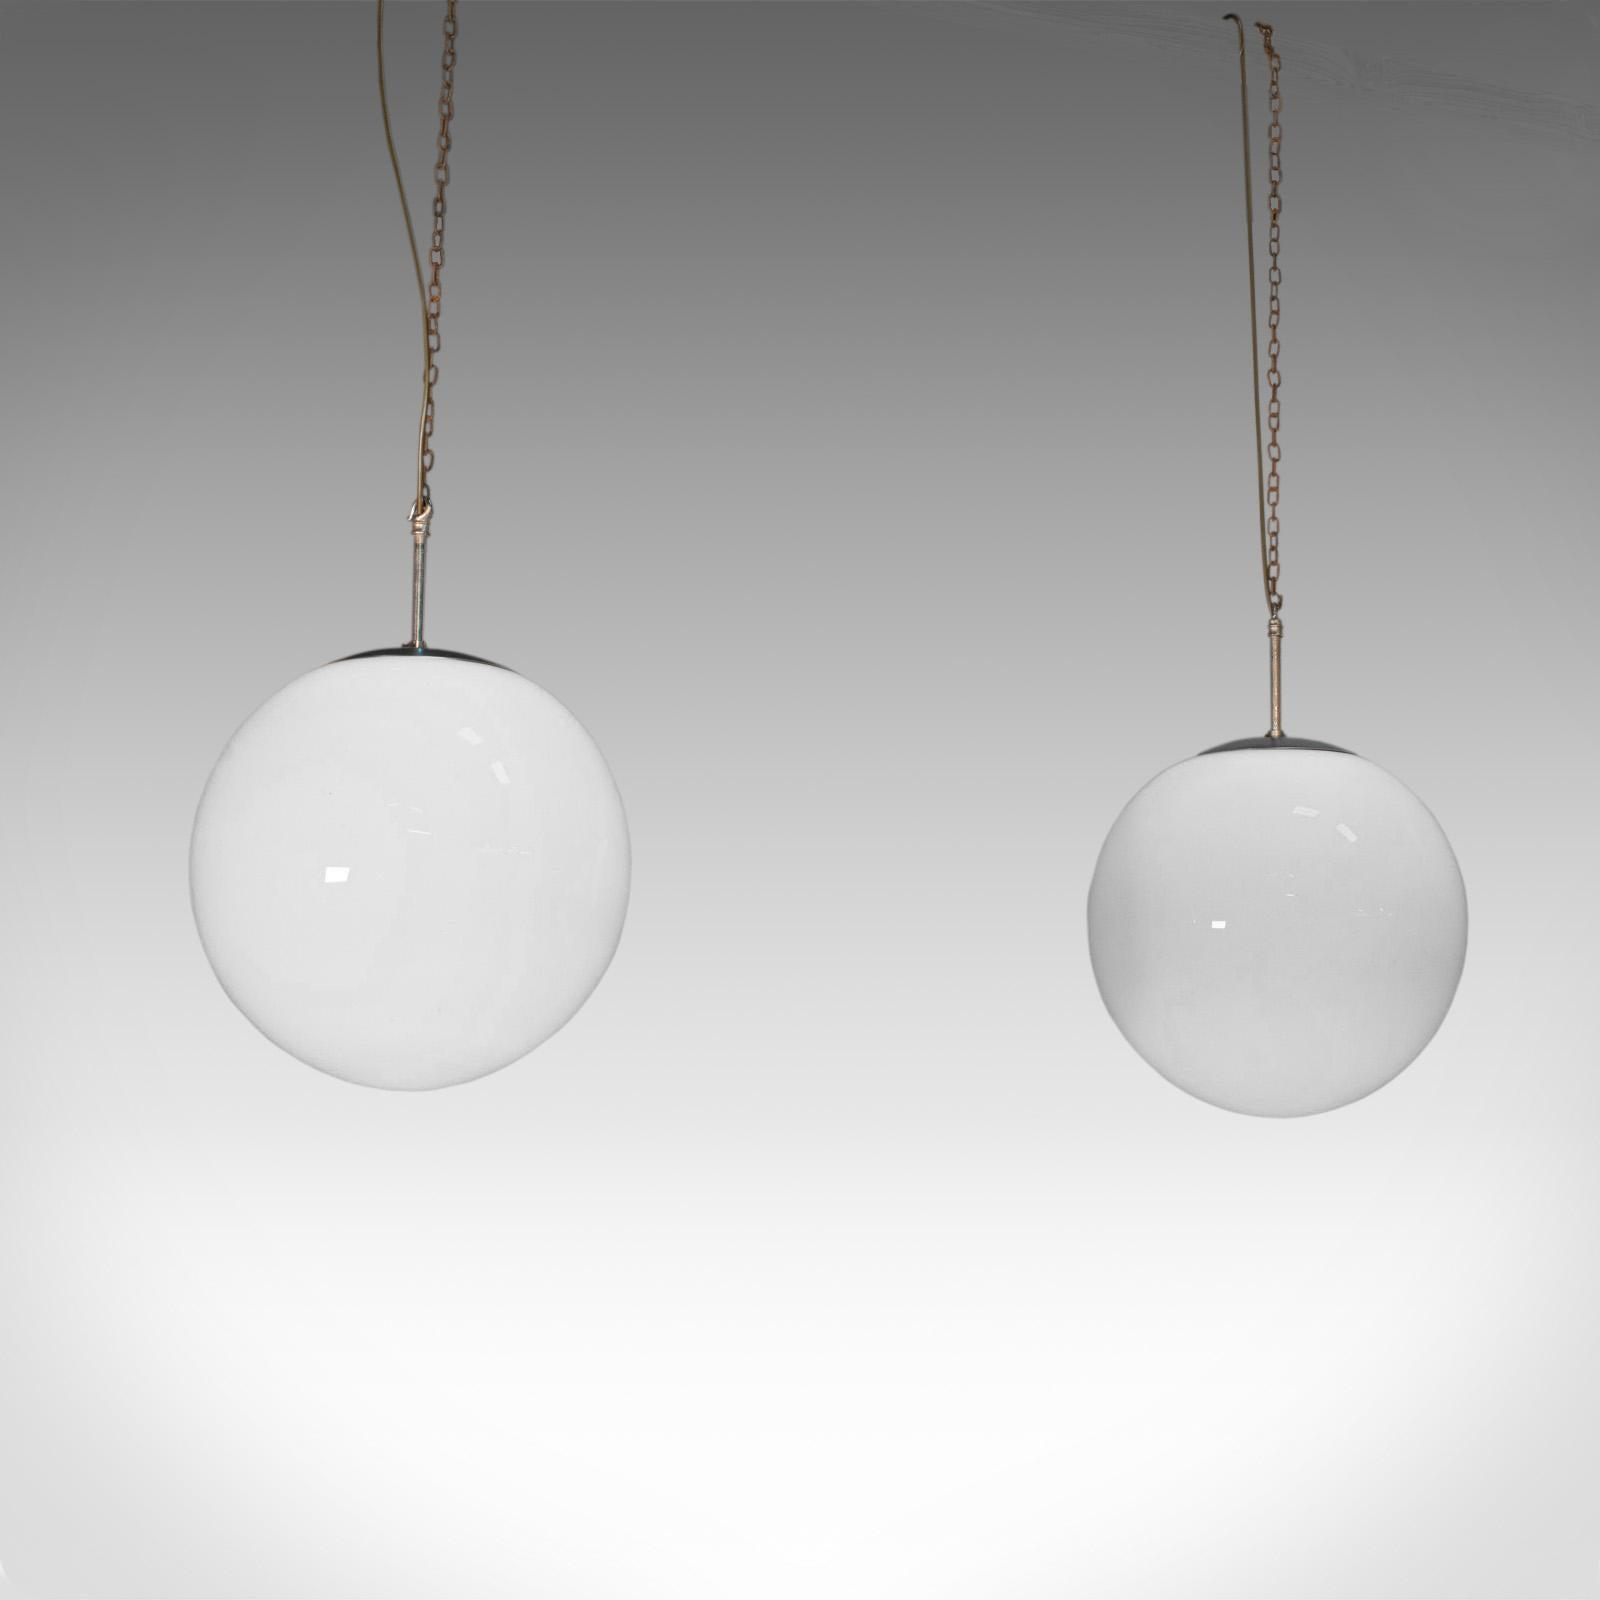 Hanging vintage opaline